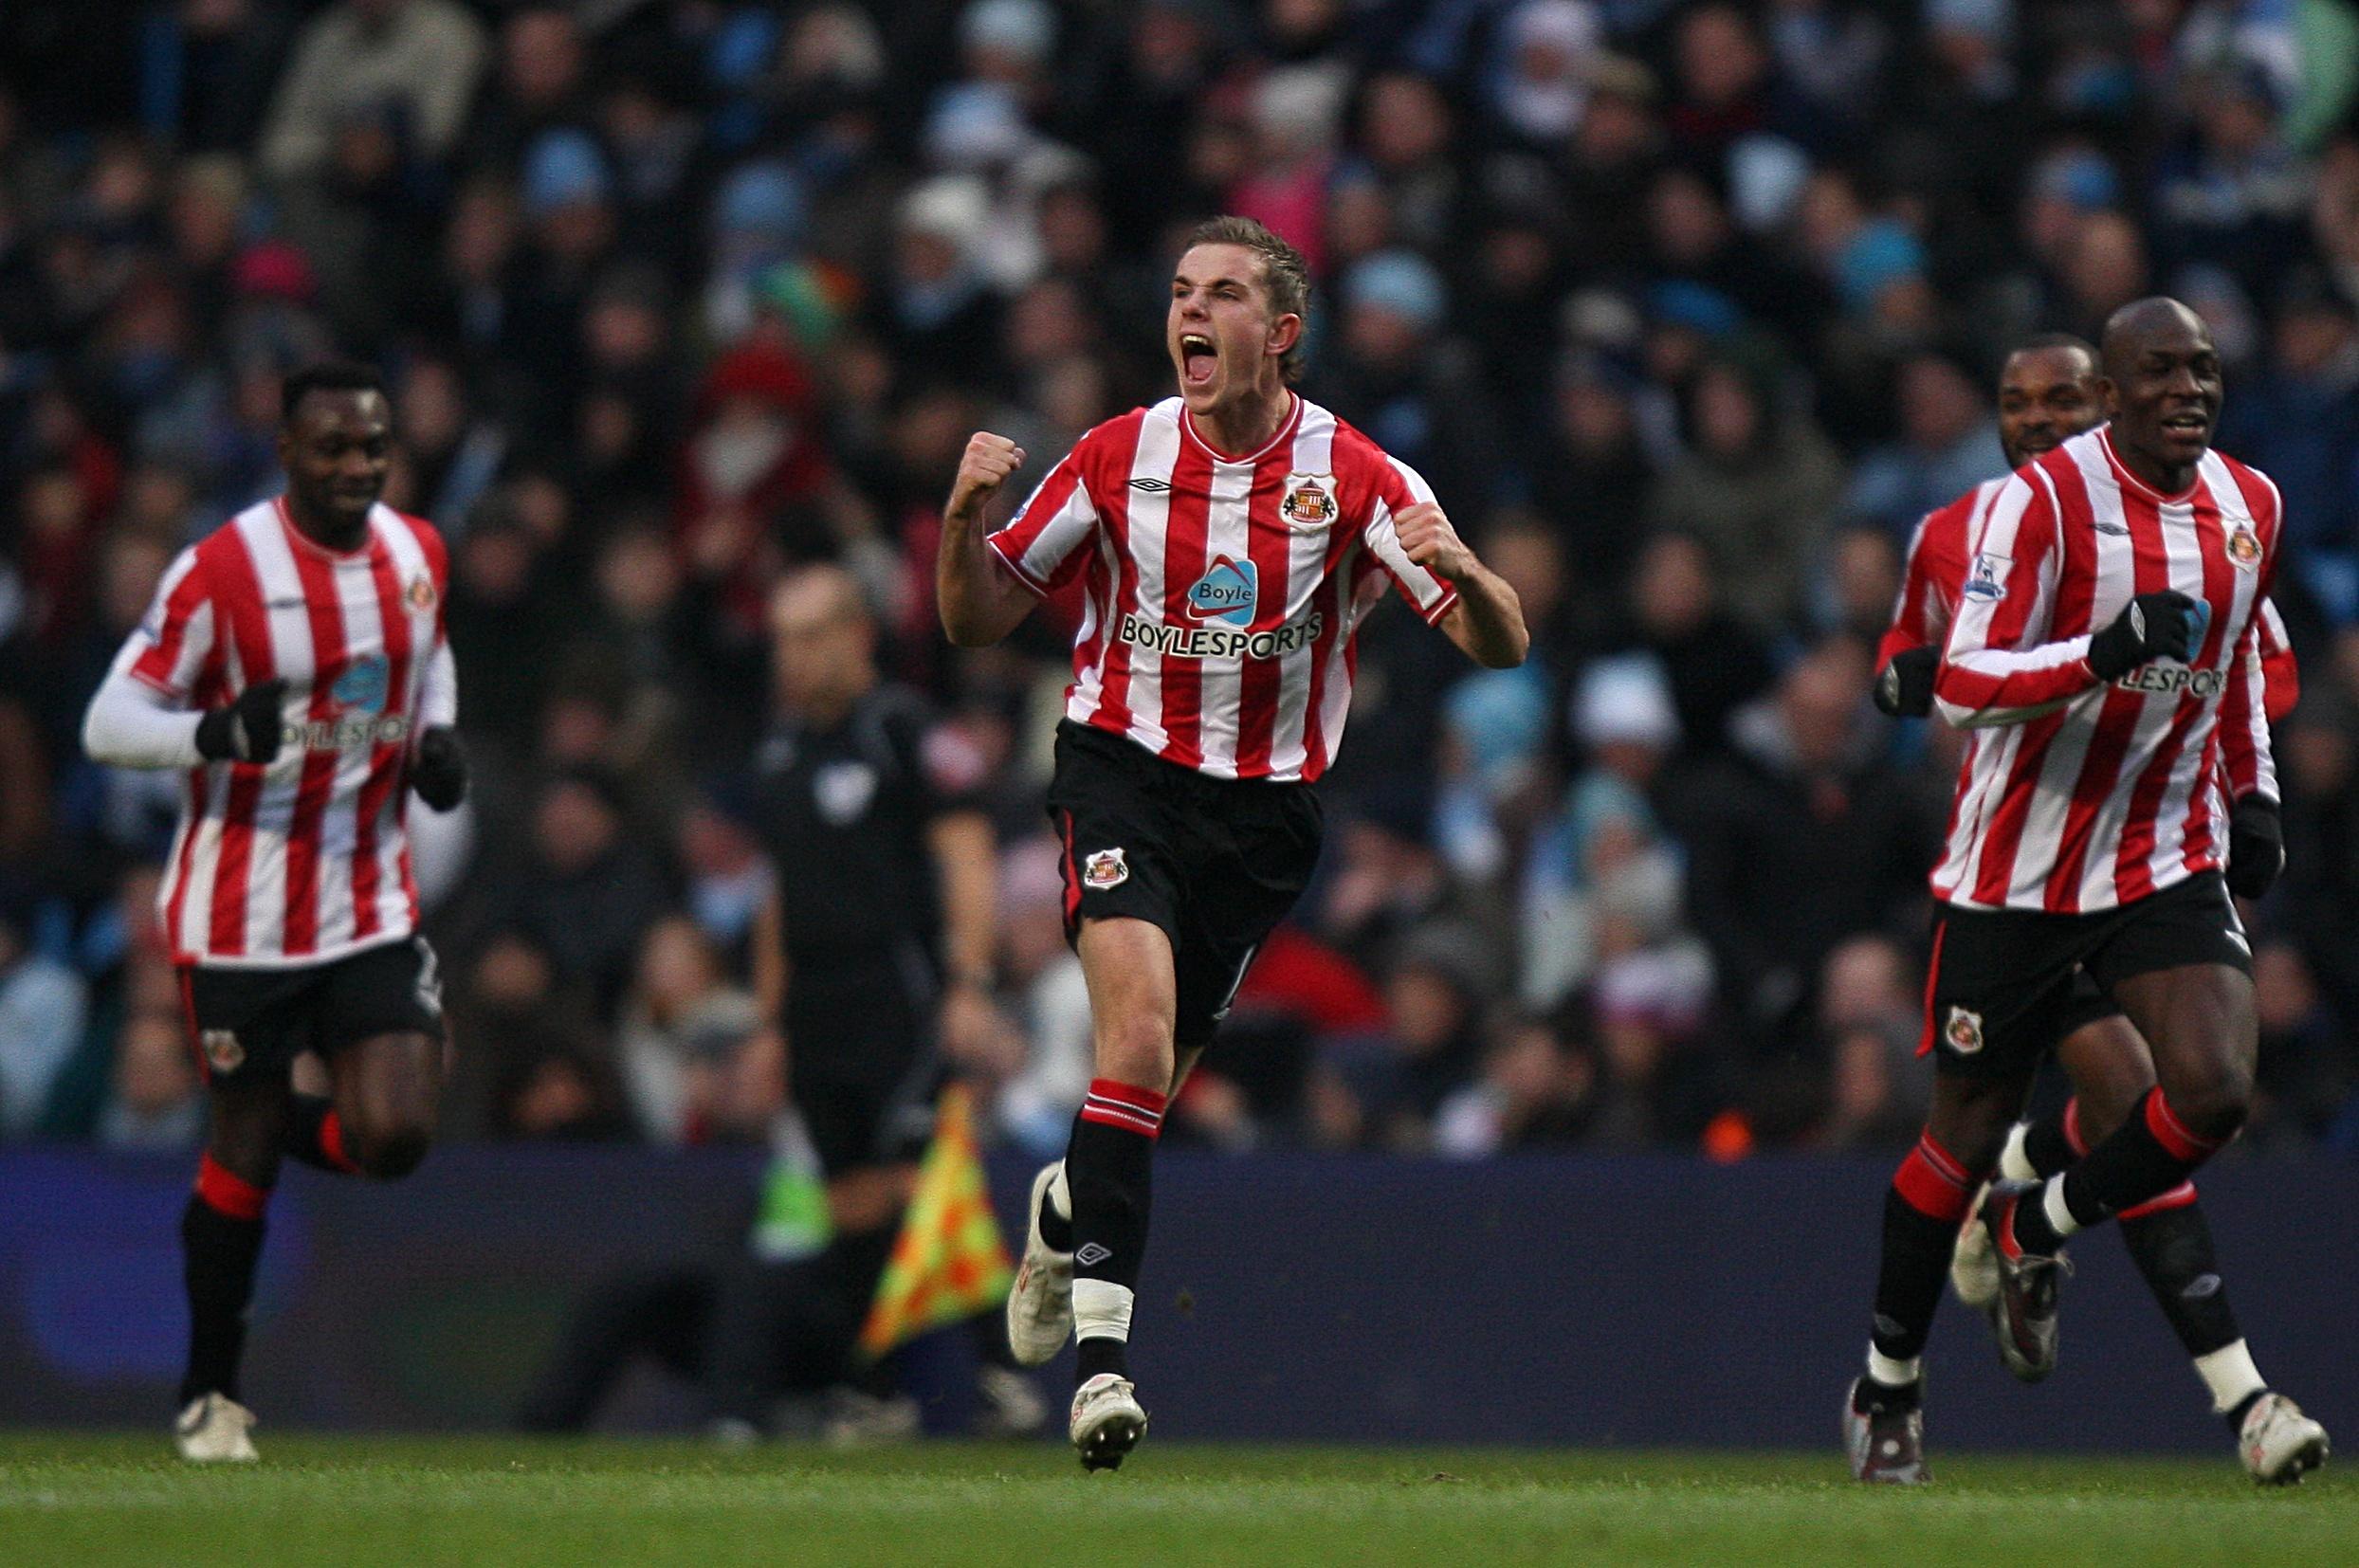 Soccer - Barclays Premier League - Manchester City v Sunderland - City of Manchester Stadium